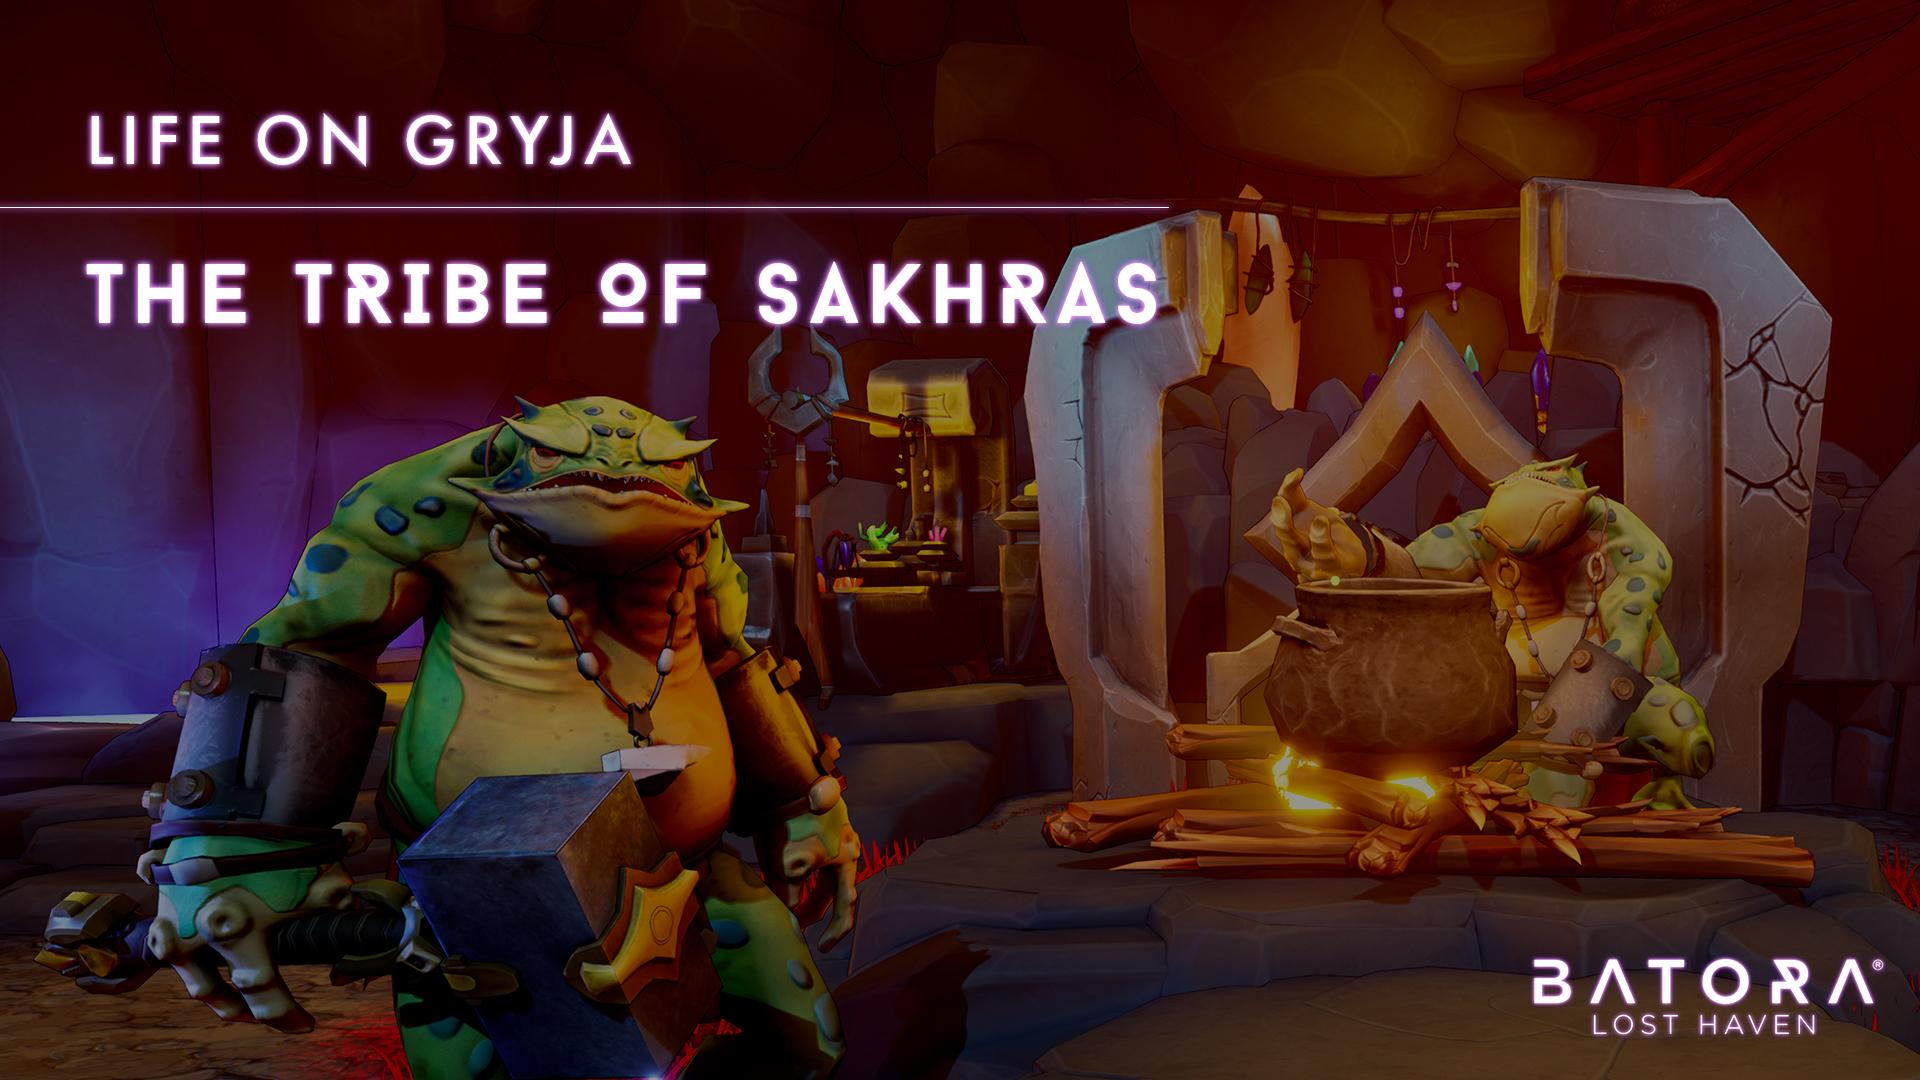 Life on Gryja: The Tribe of Sakhras